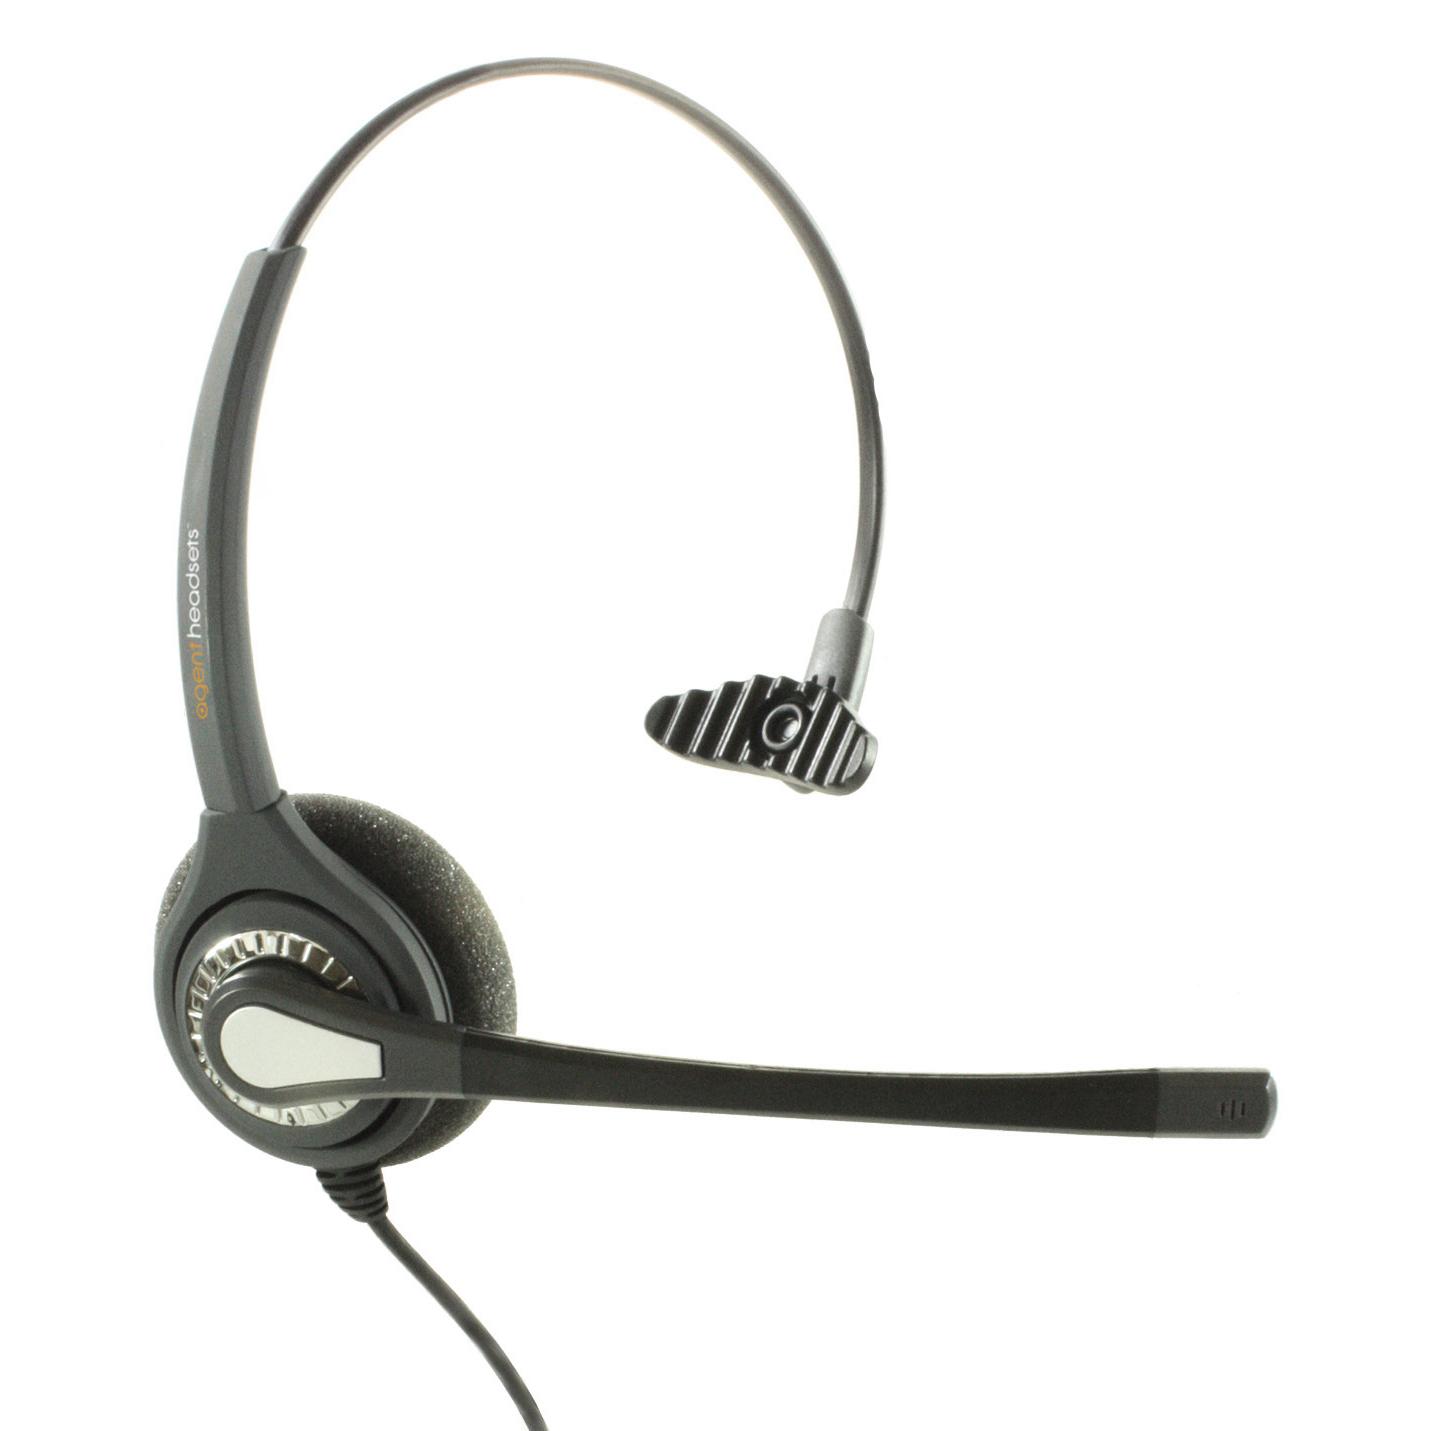 Agent 401 USB Mono Headset & Microphone